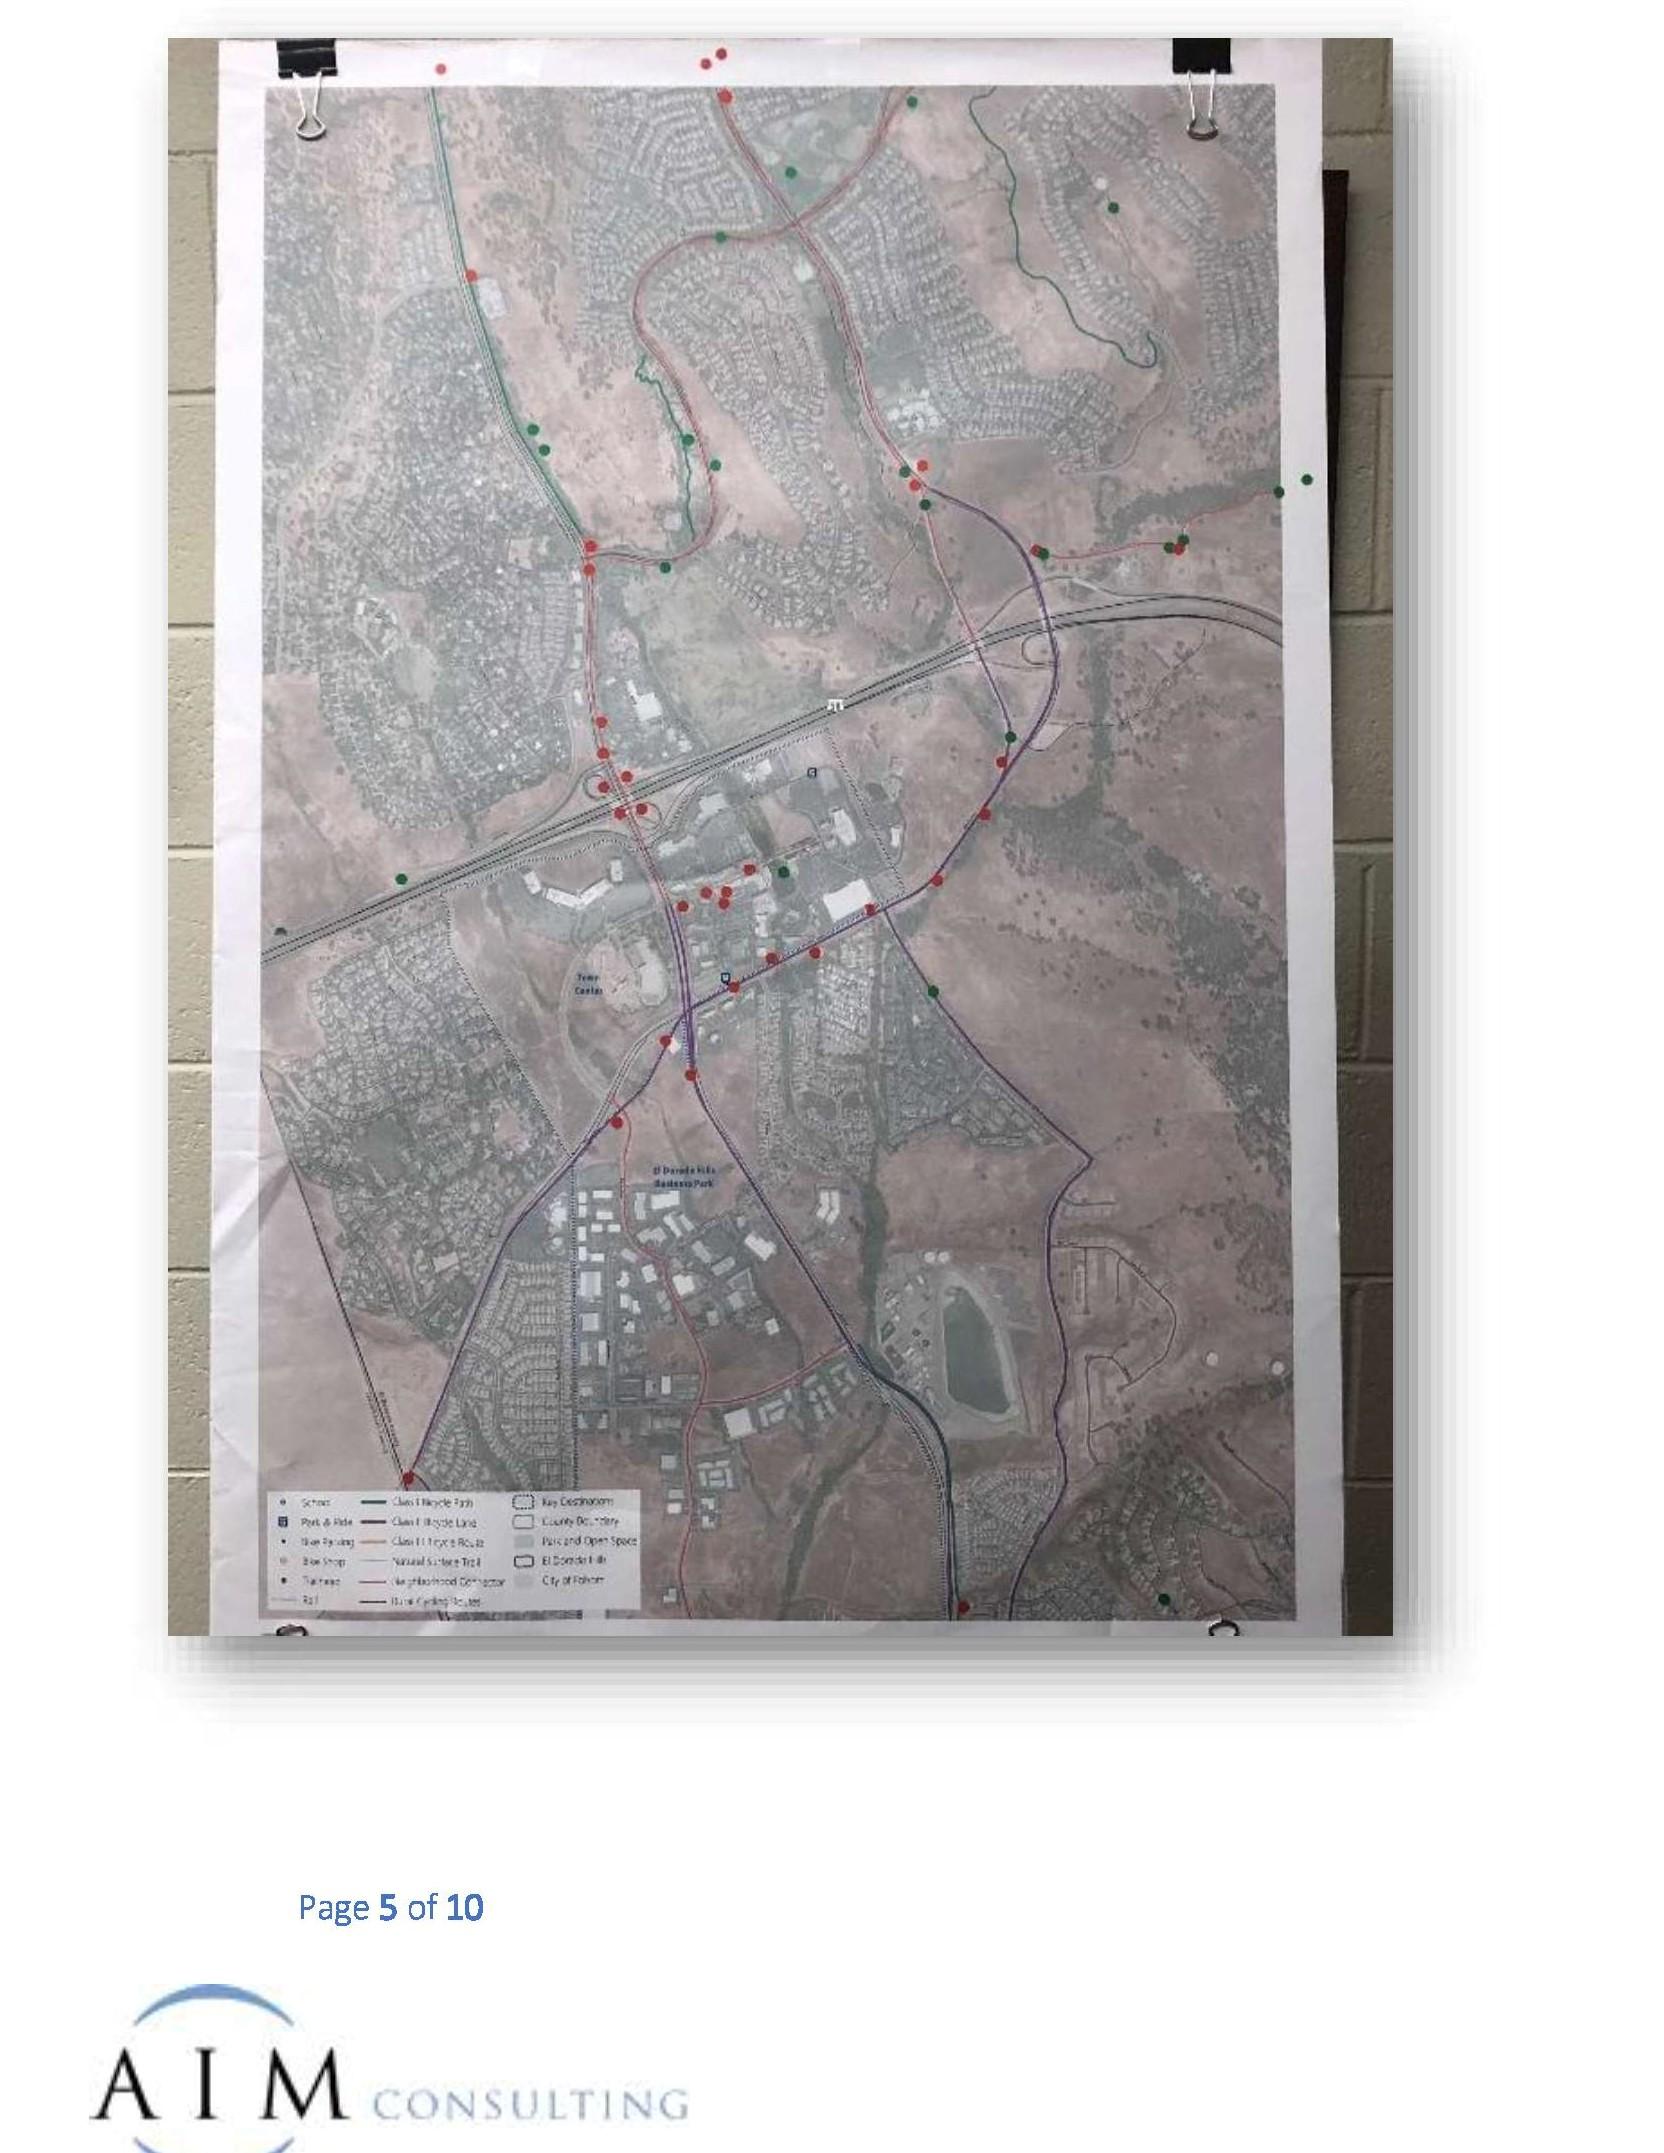 Development Archives - El Dorado Hills Area Planning Advisory Committee